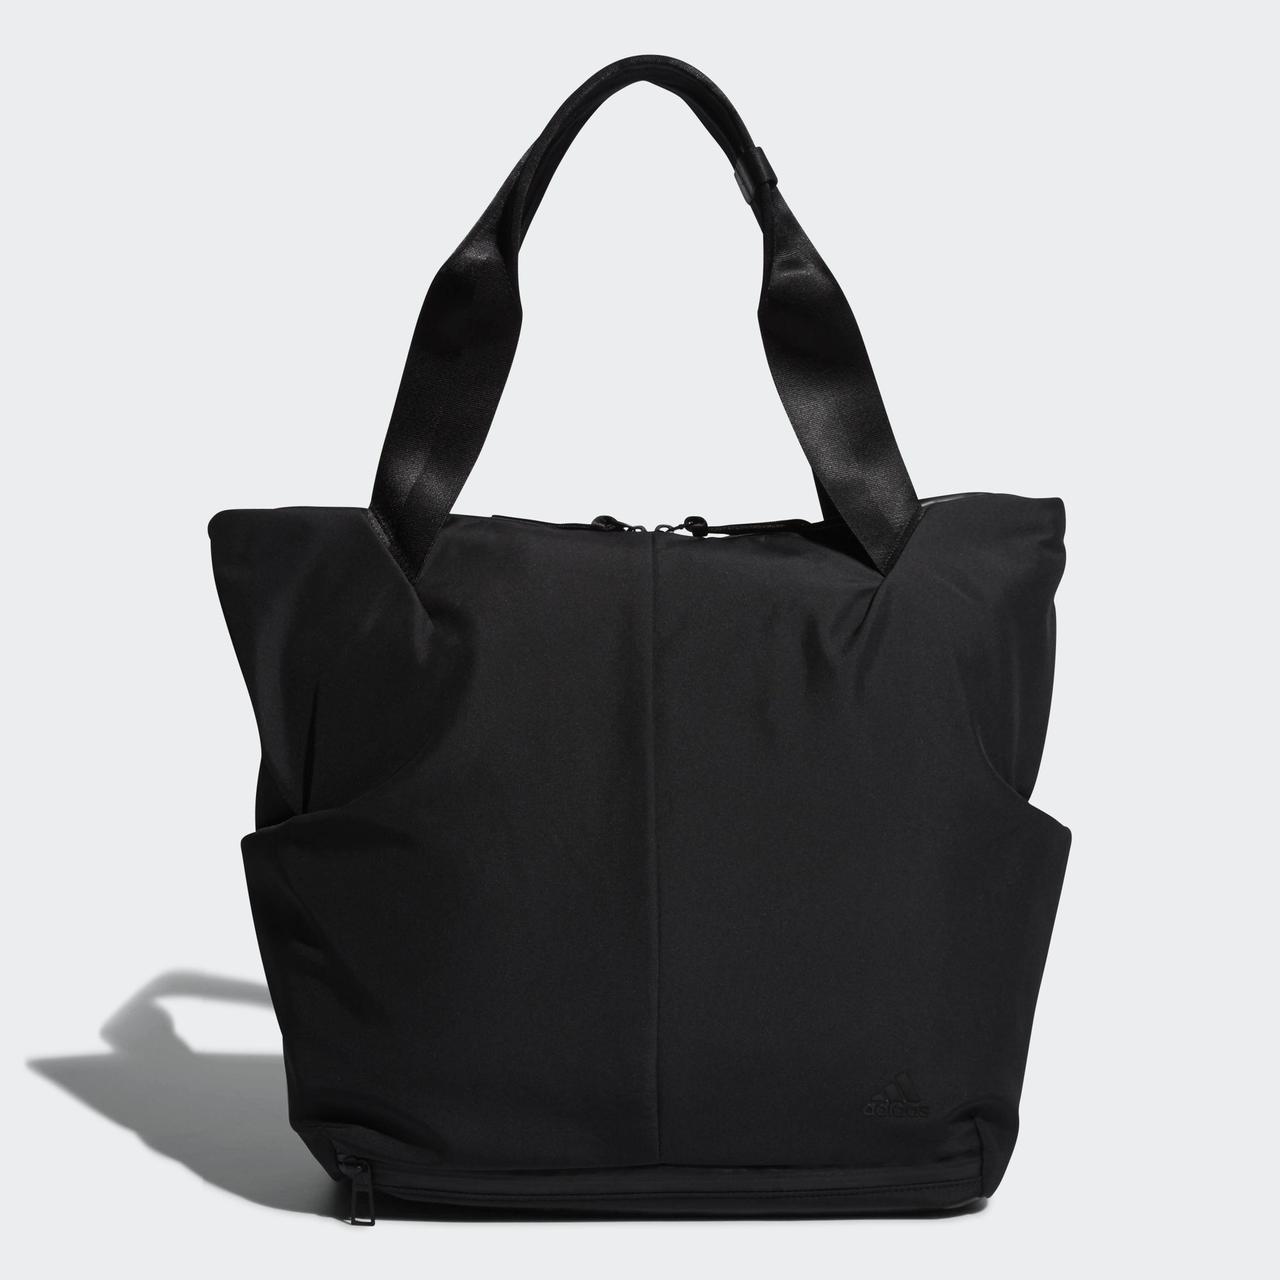 03fe9b0a557e Женская сумка Adidas Favorites Medium DT3764 - 2019: продажа, цена в ...